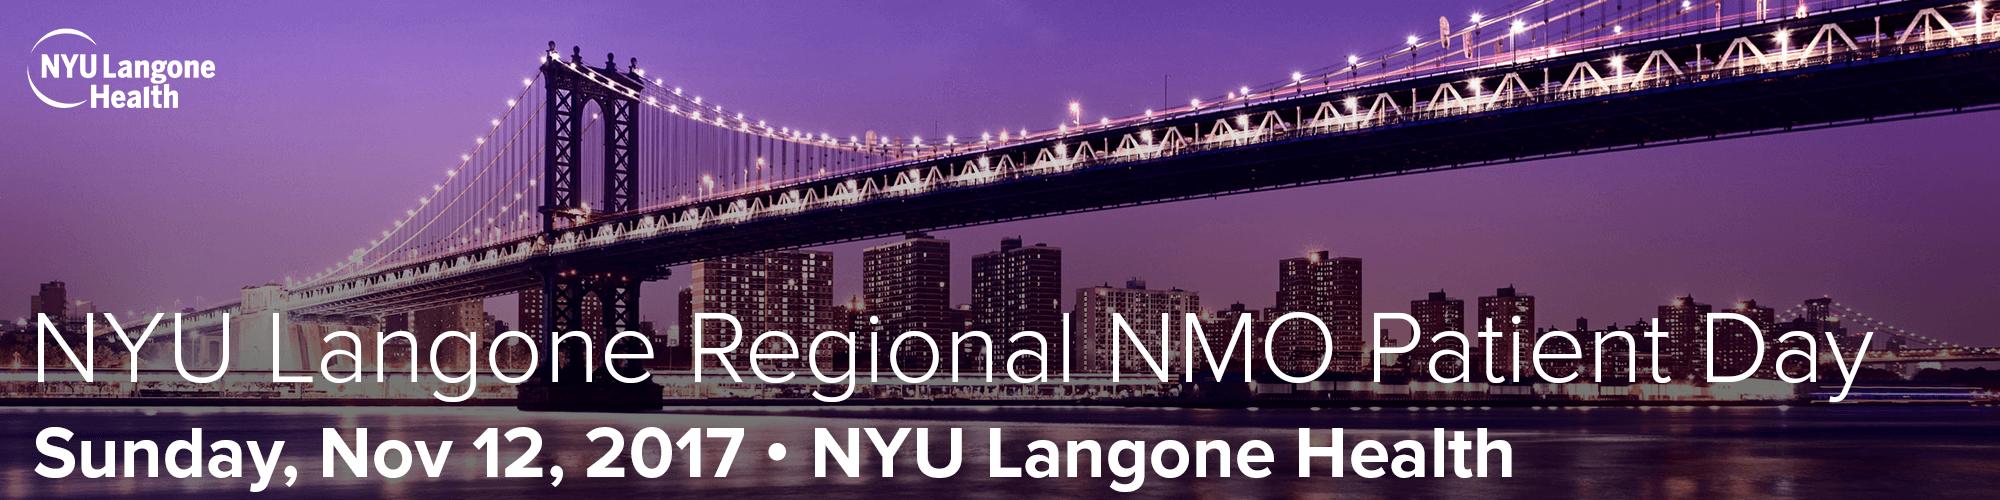 NYU Langone NMO Patient Day